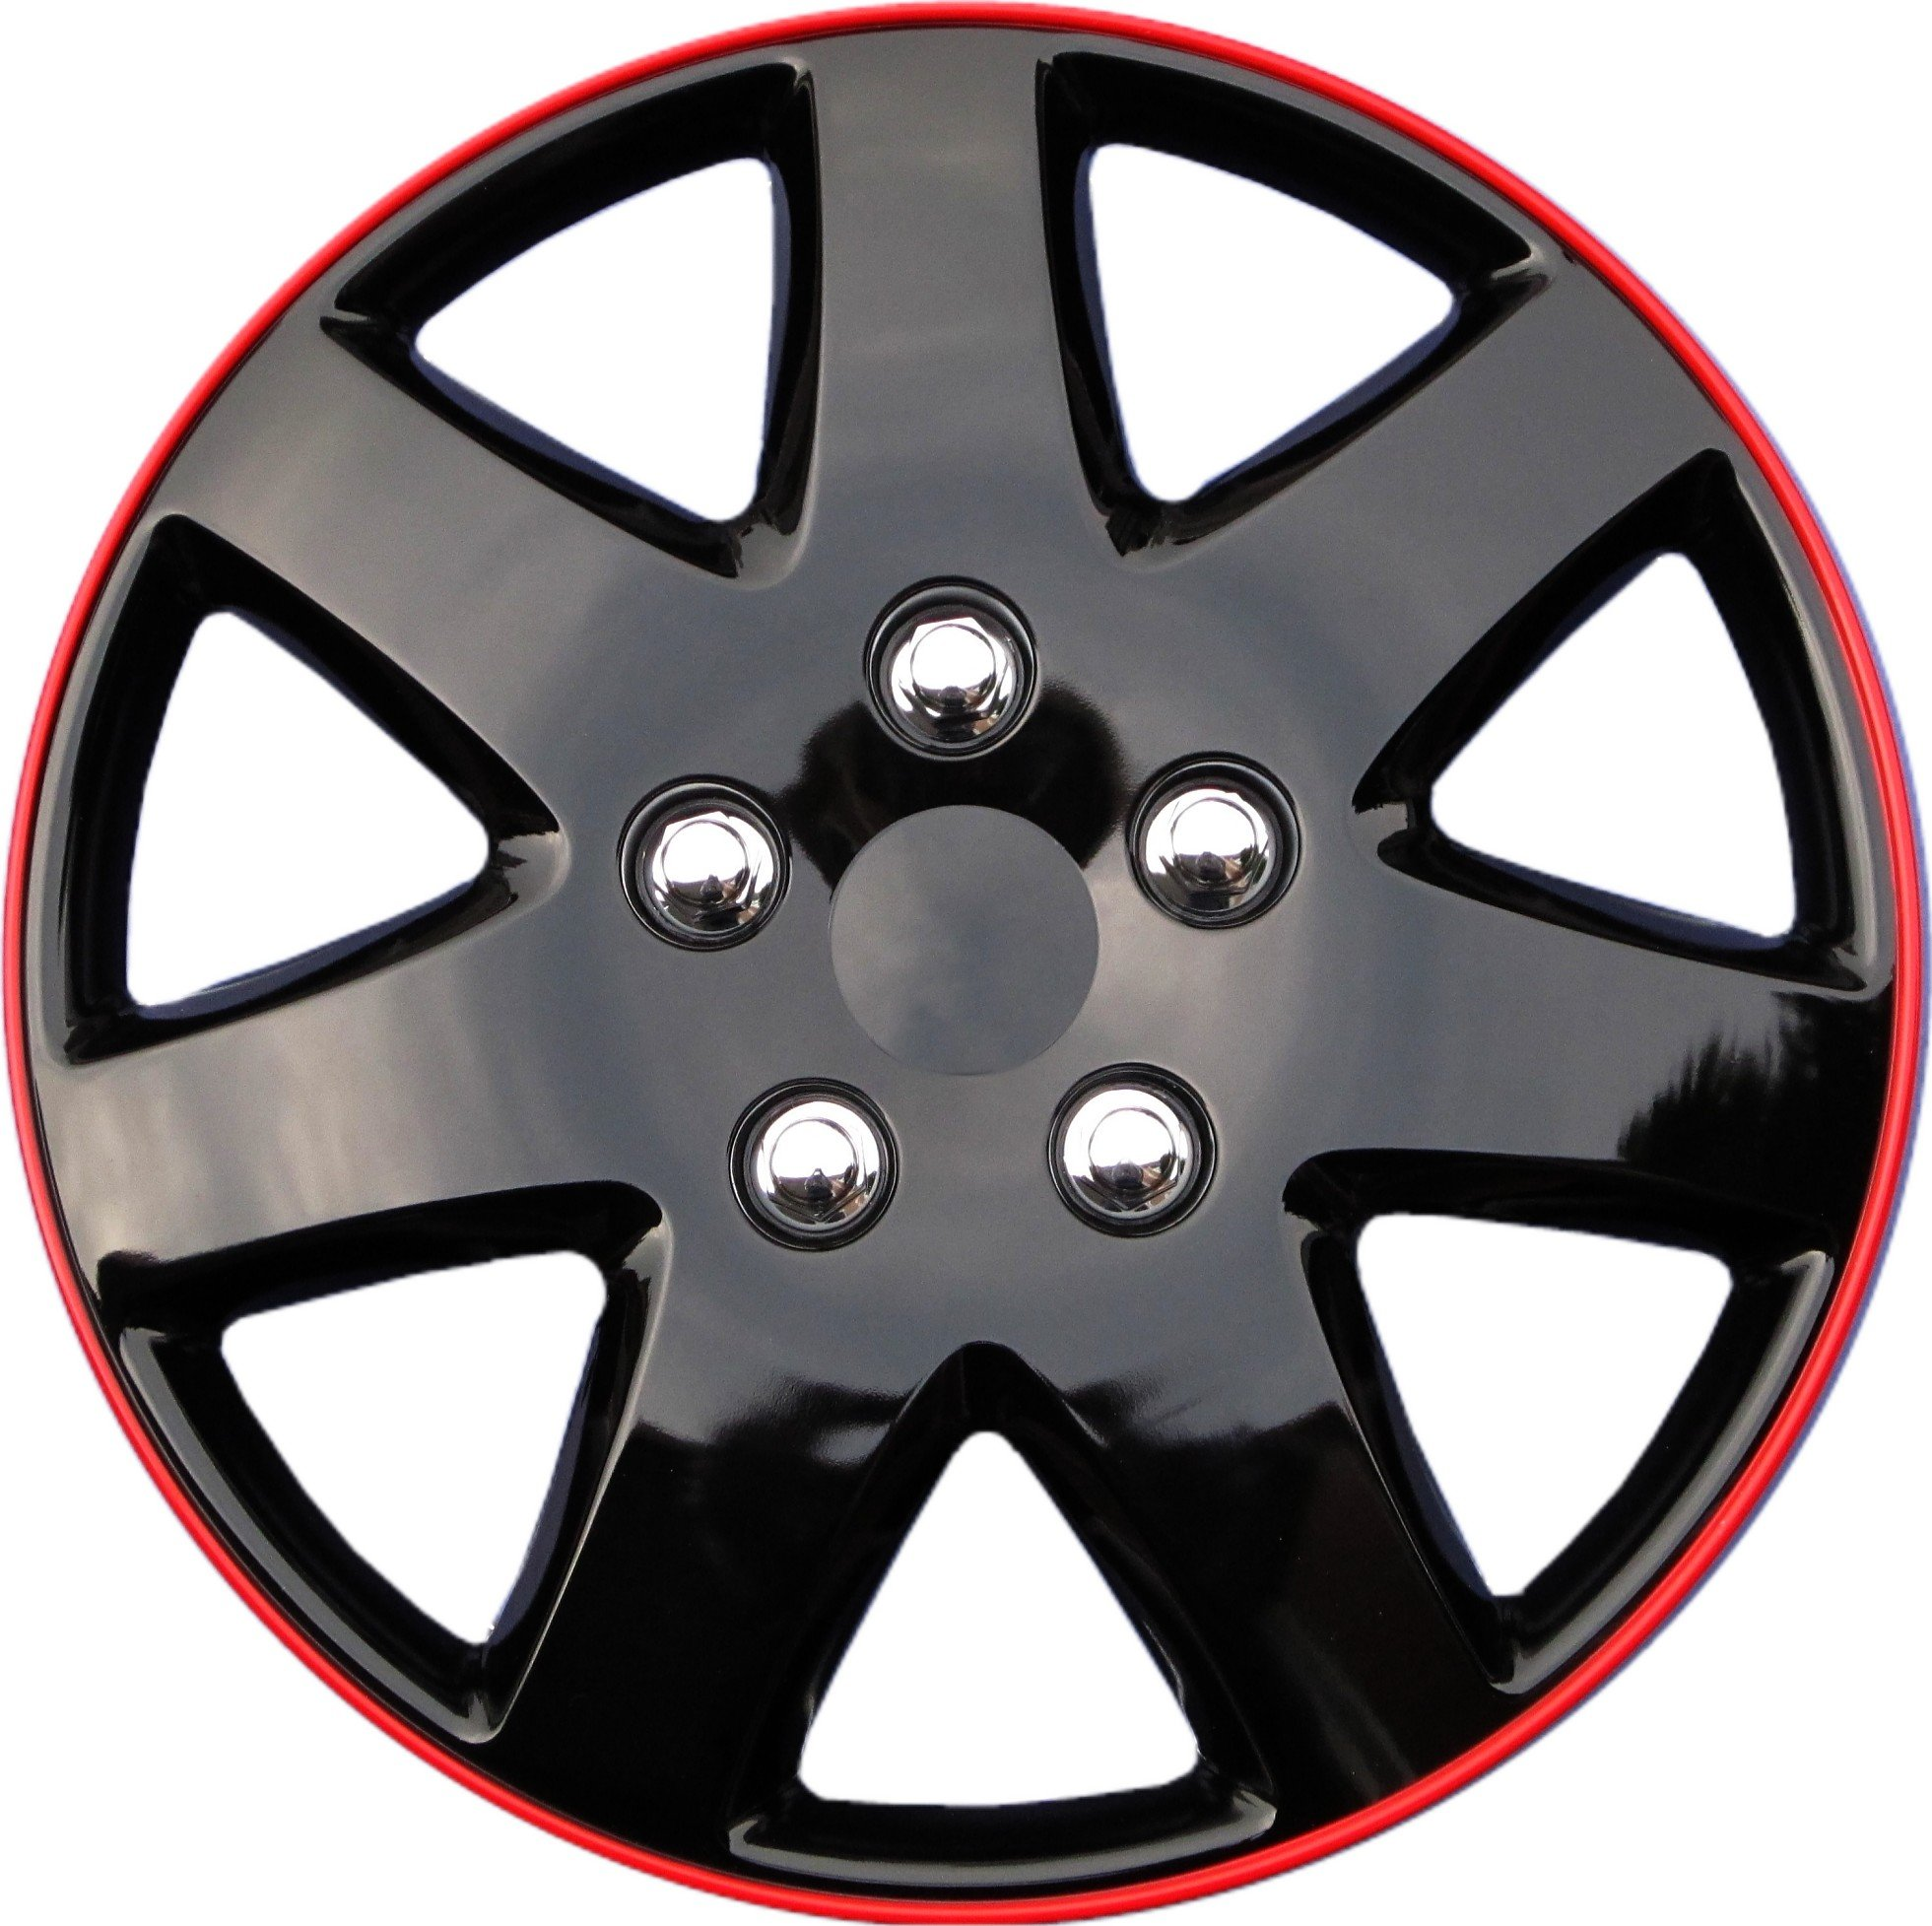 AutoSmart Drive Accessories KT-962-15IB+R, Toyota Paseo, 15'' Ice Black Replica Wheel Cover, (Set of 4)